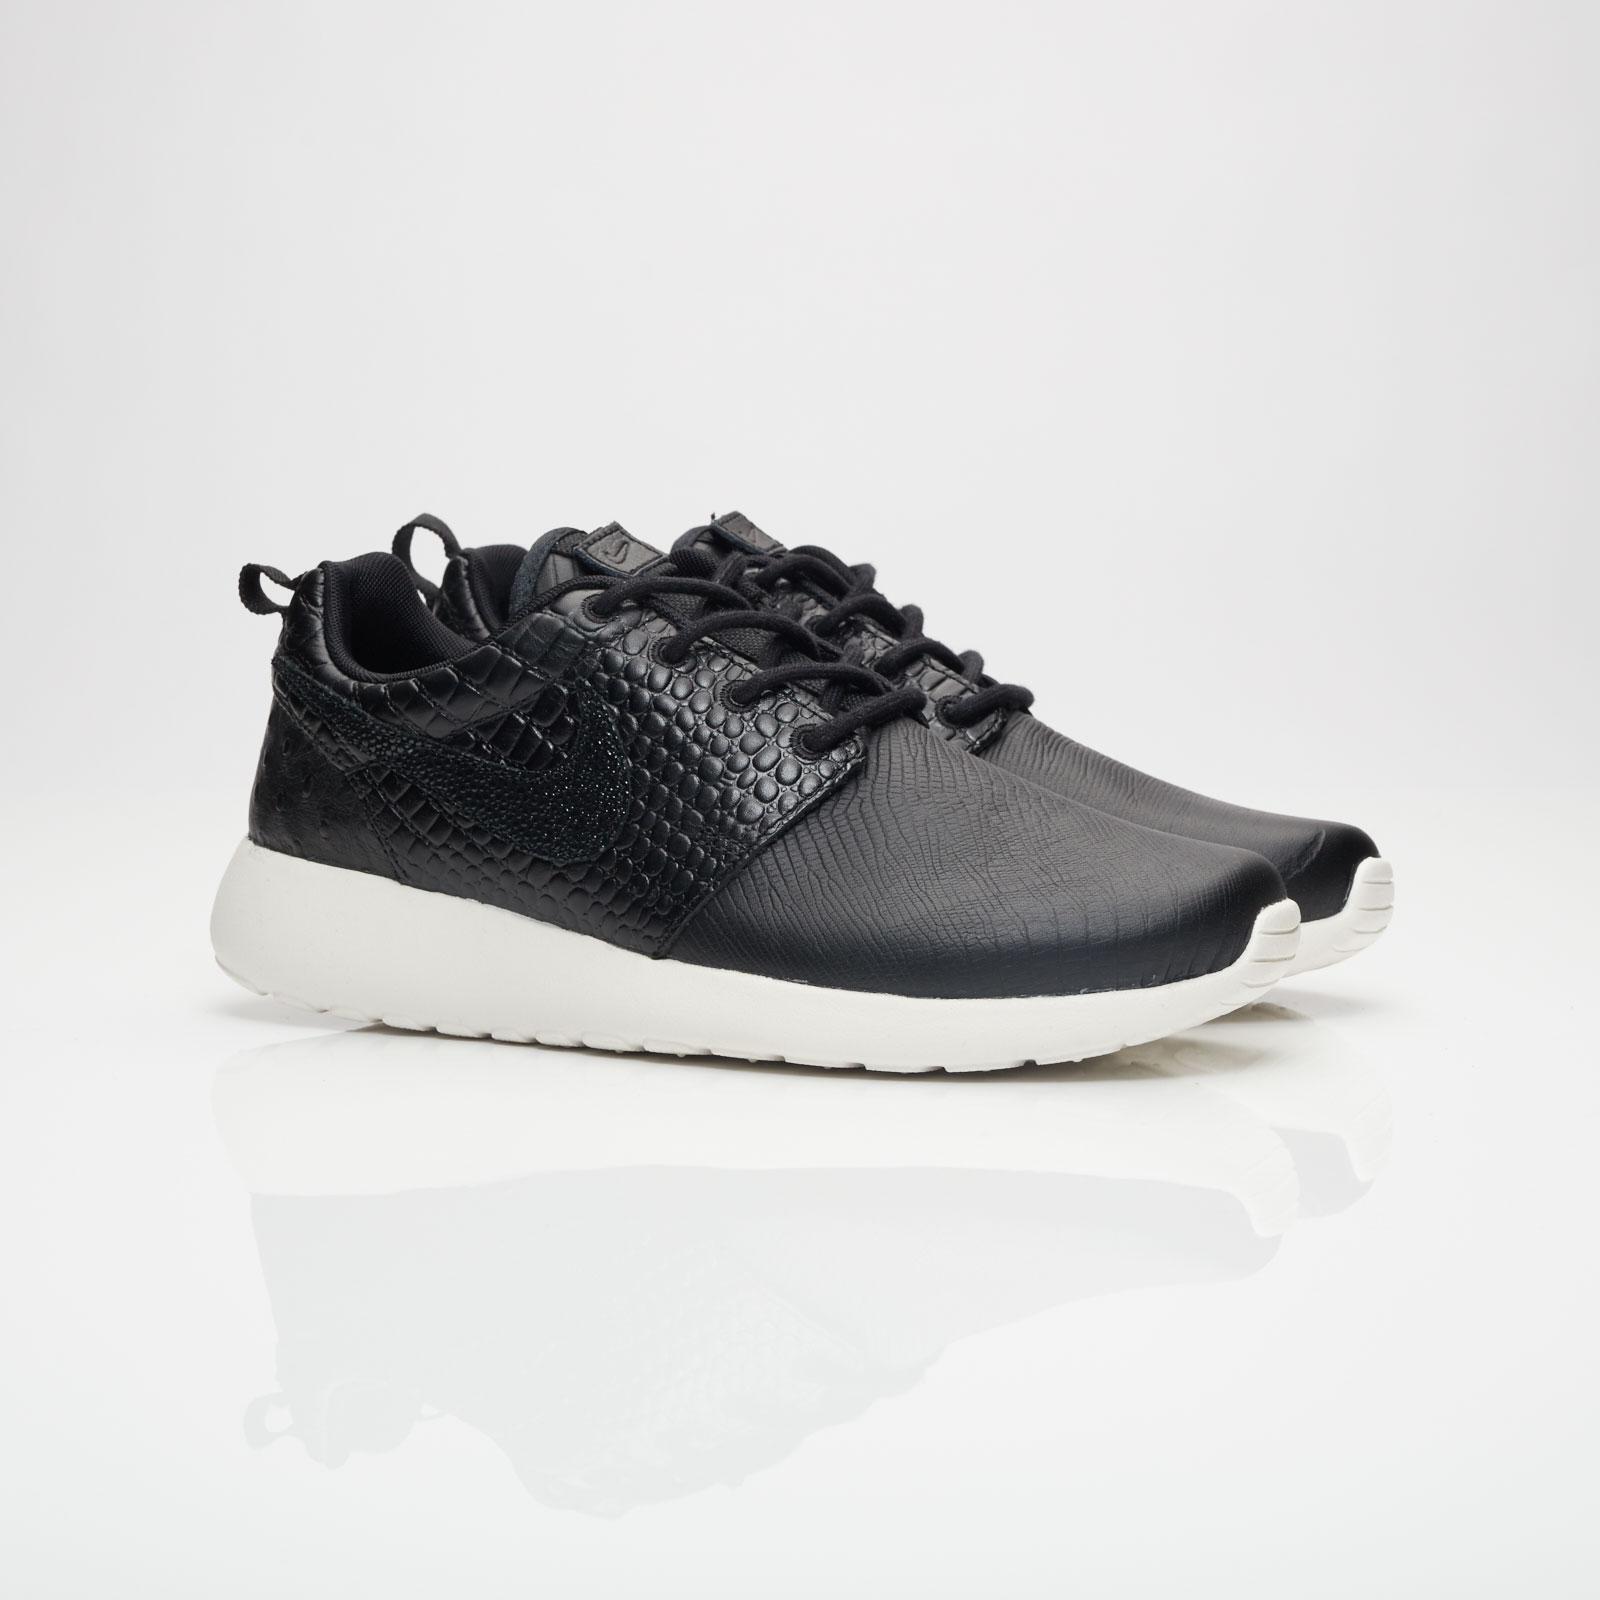 3ebdf4f521b9e Nike Wmns Roshe One Lx - 881202-001 - Sneakersnstuff